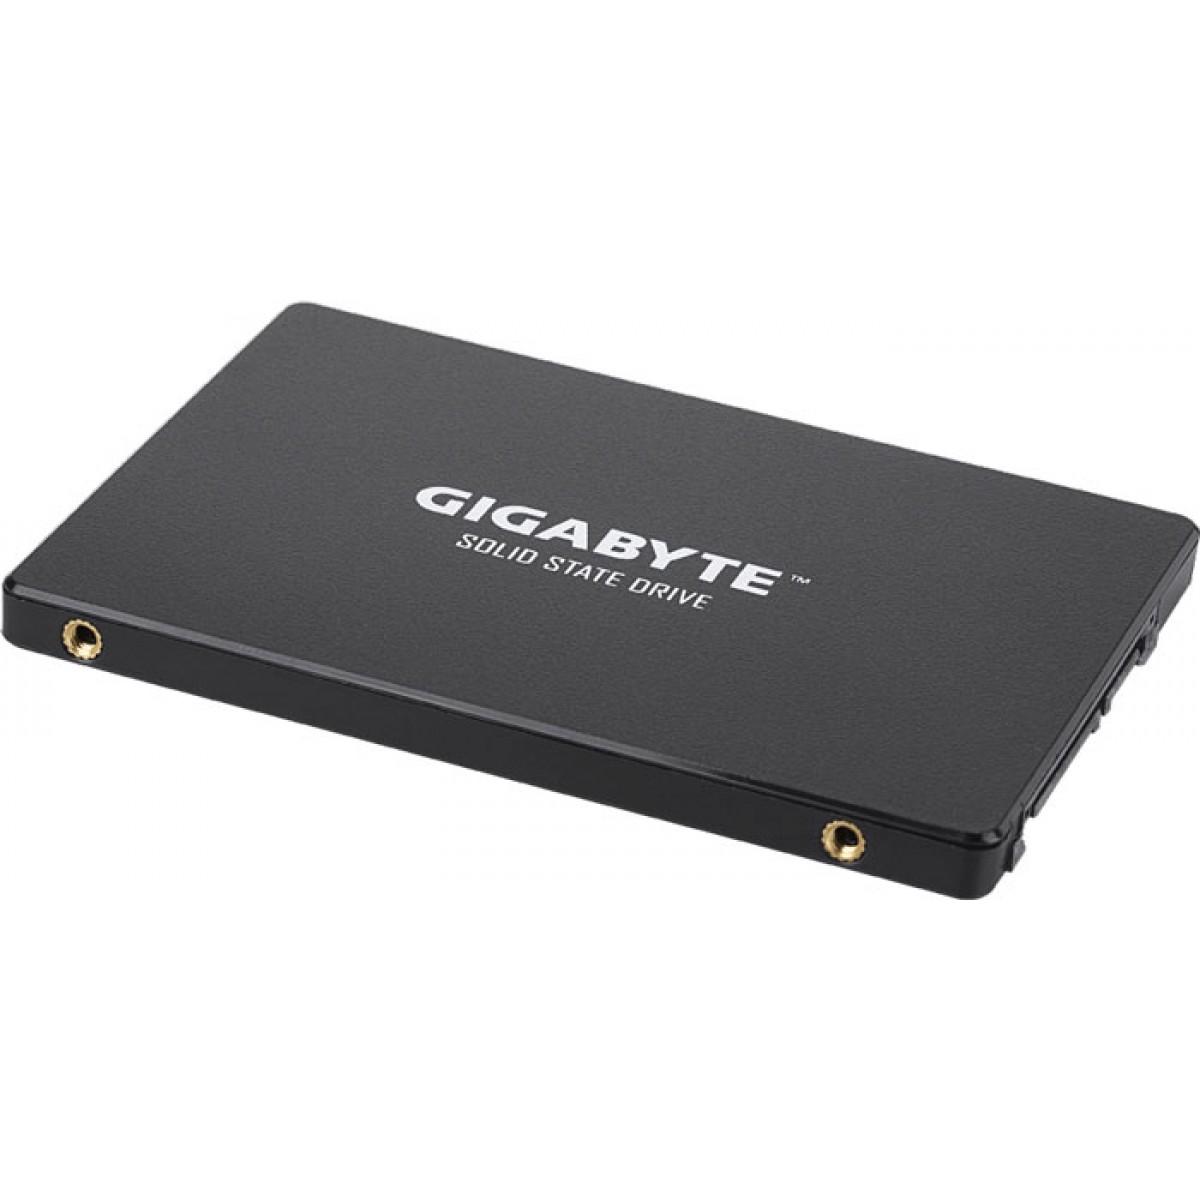 SSD Gigabyte 480GB, Sata III, Leitura 550MBs e Gravação 480MBs